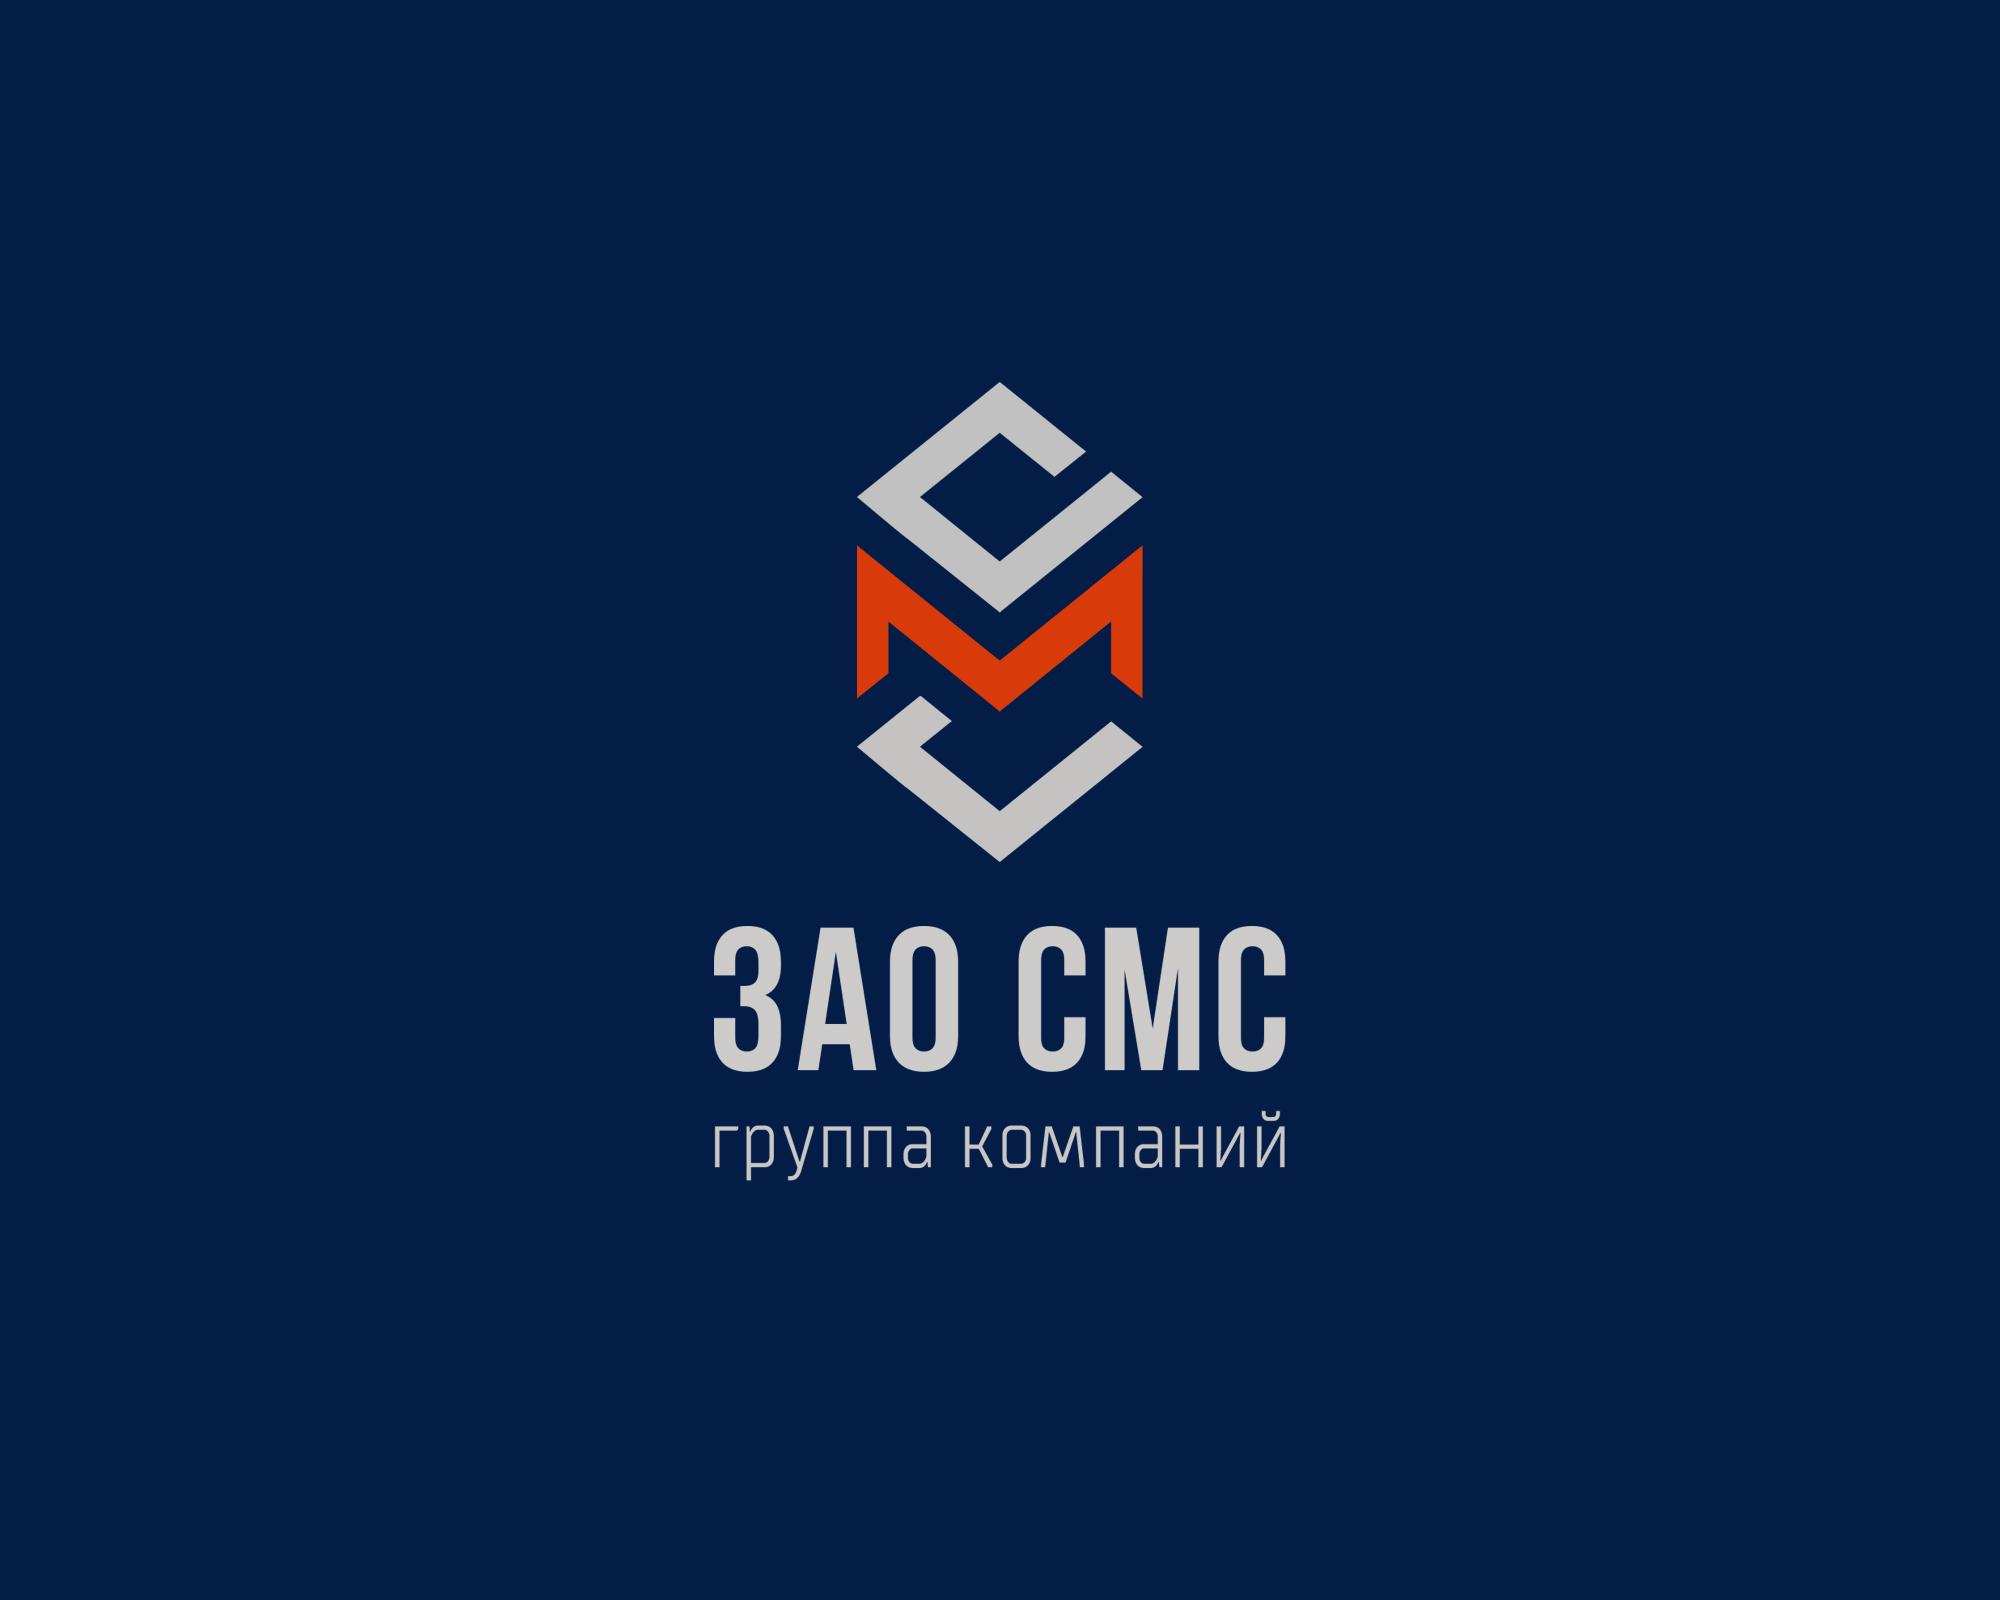 Дизайнер для разработки Логотипа для организации !СРОЧНО! фото f_8015a2abc73ec38a.jpg